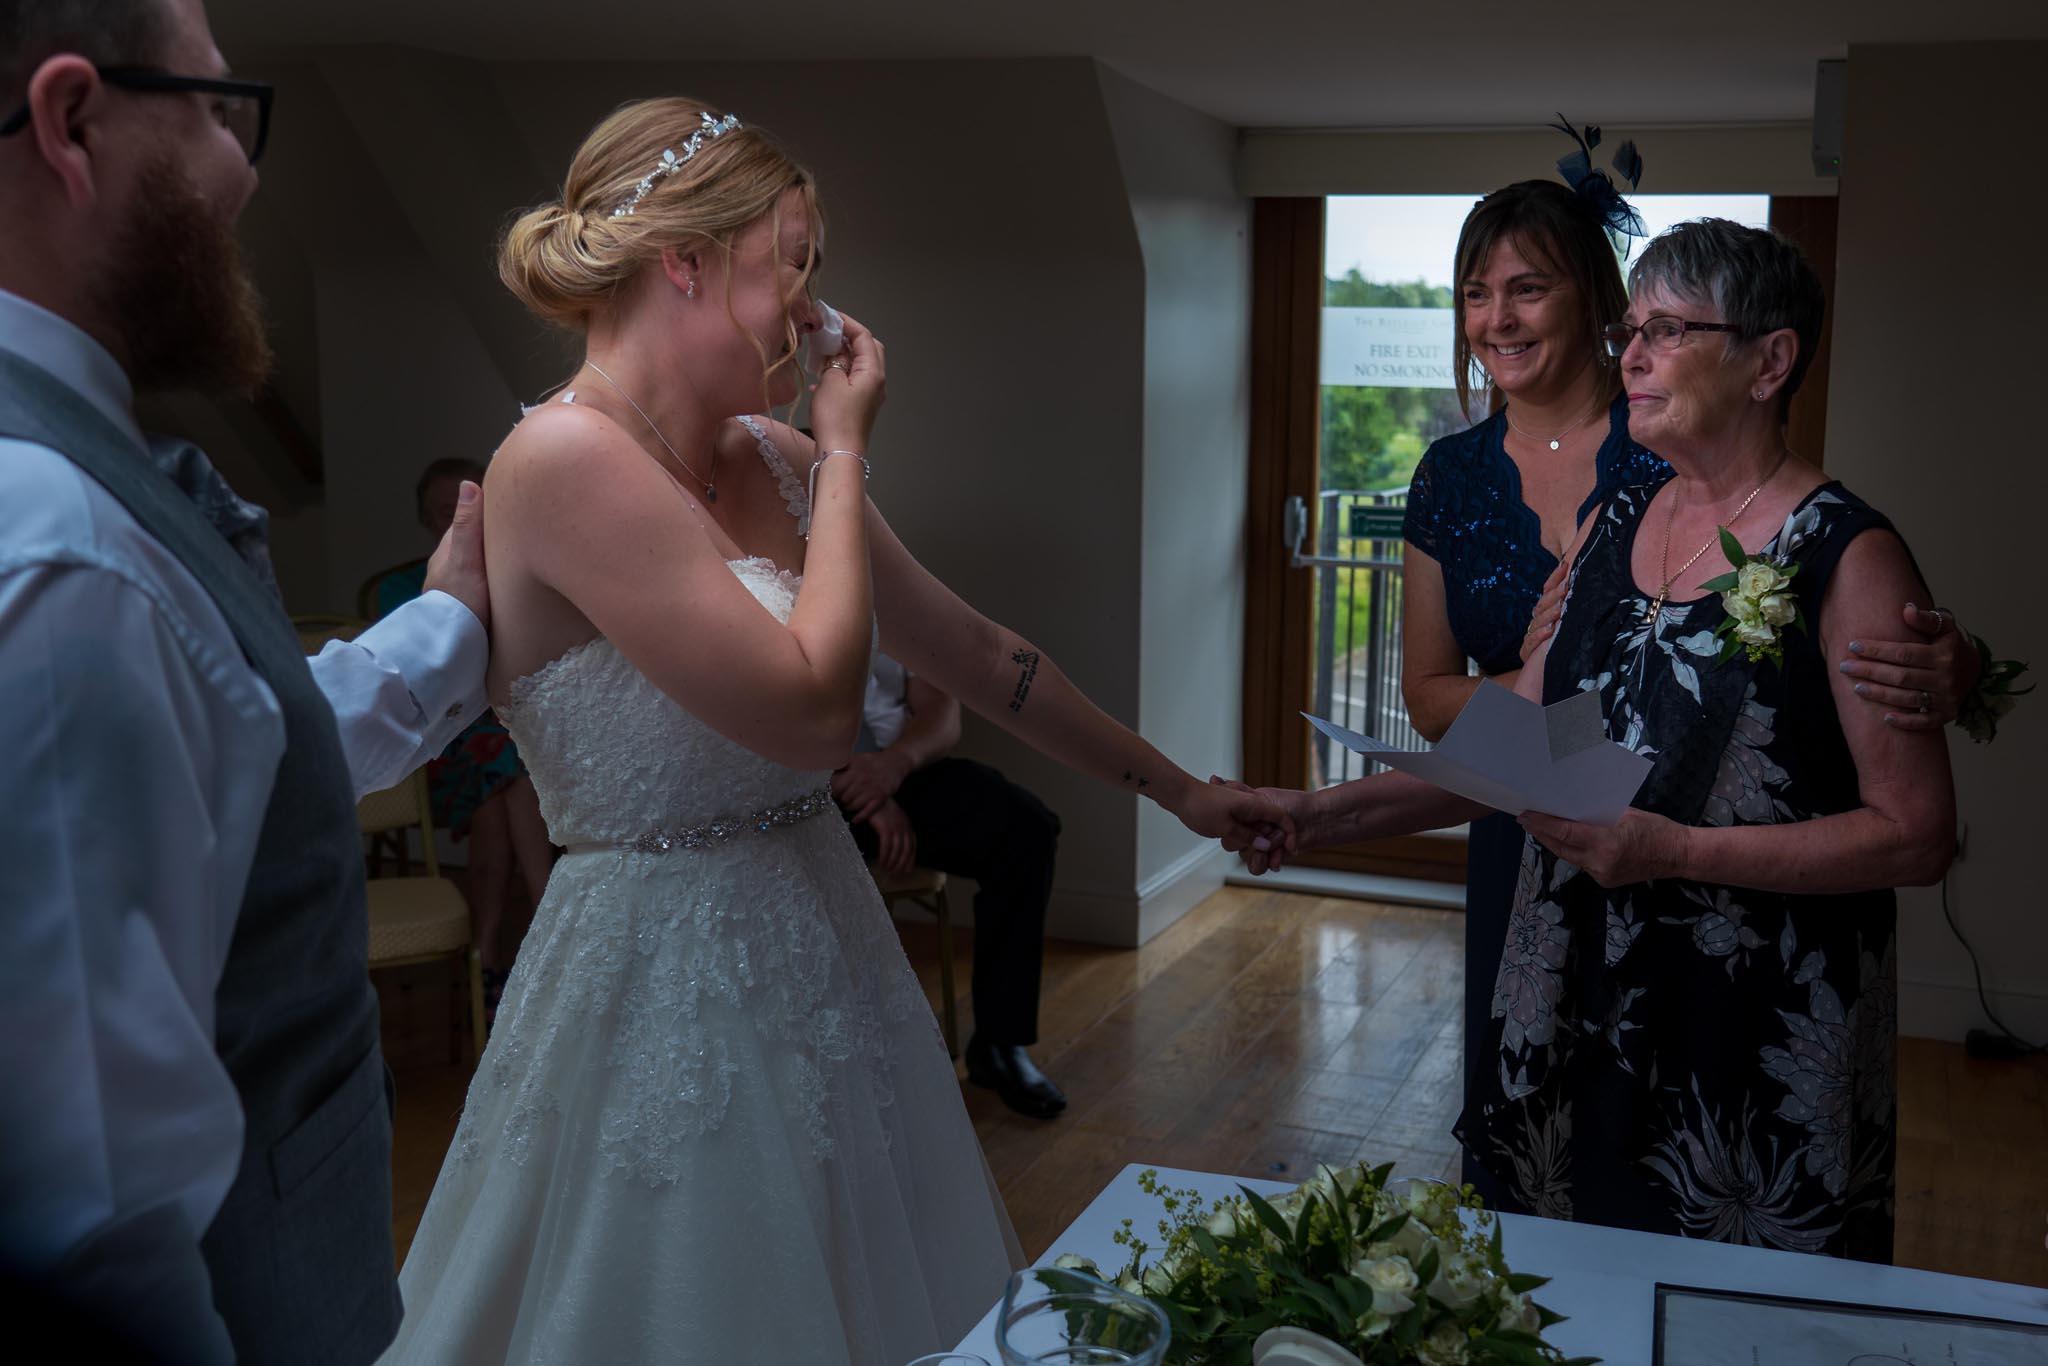 376-Ceremony-Luke-Yasmin-The-Rayleigh-Club-Wedding-Photography.jpg